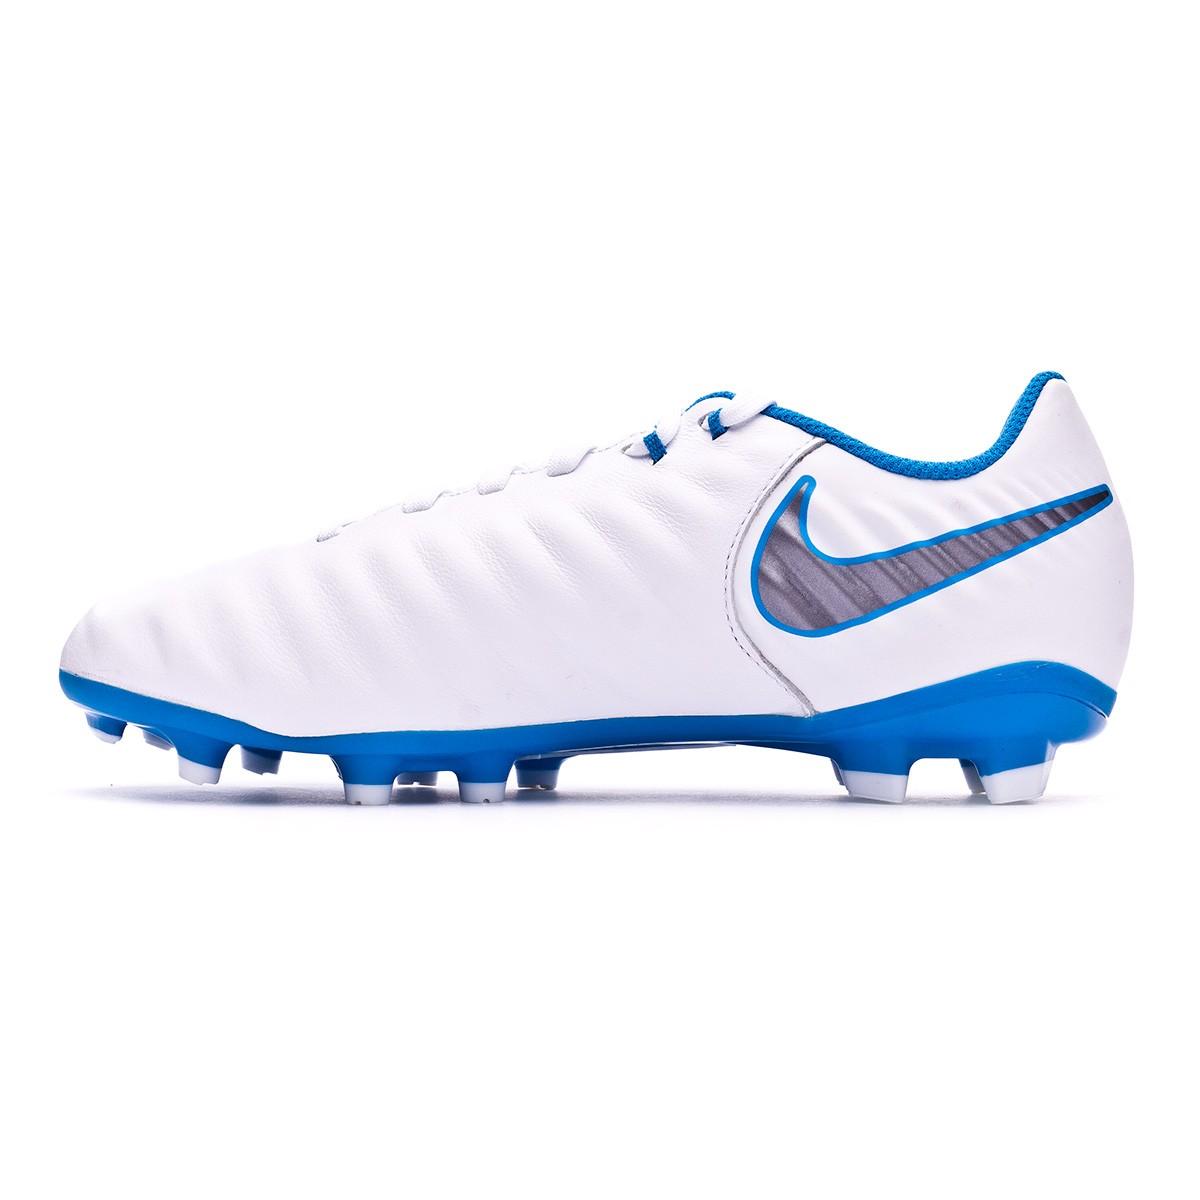 97acbfb2fb6 Football Boots Nike Kids Tiempo Legend VII Academy FG White-Metallic cool  grey-Blue hero - Football store Fútbol Emotion